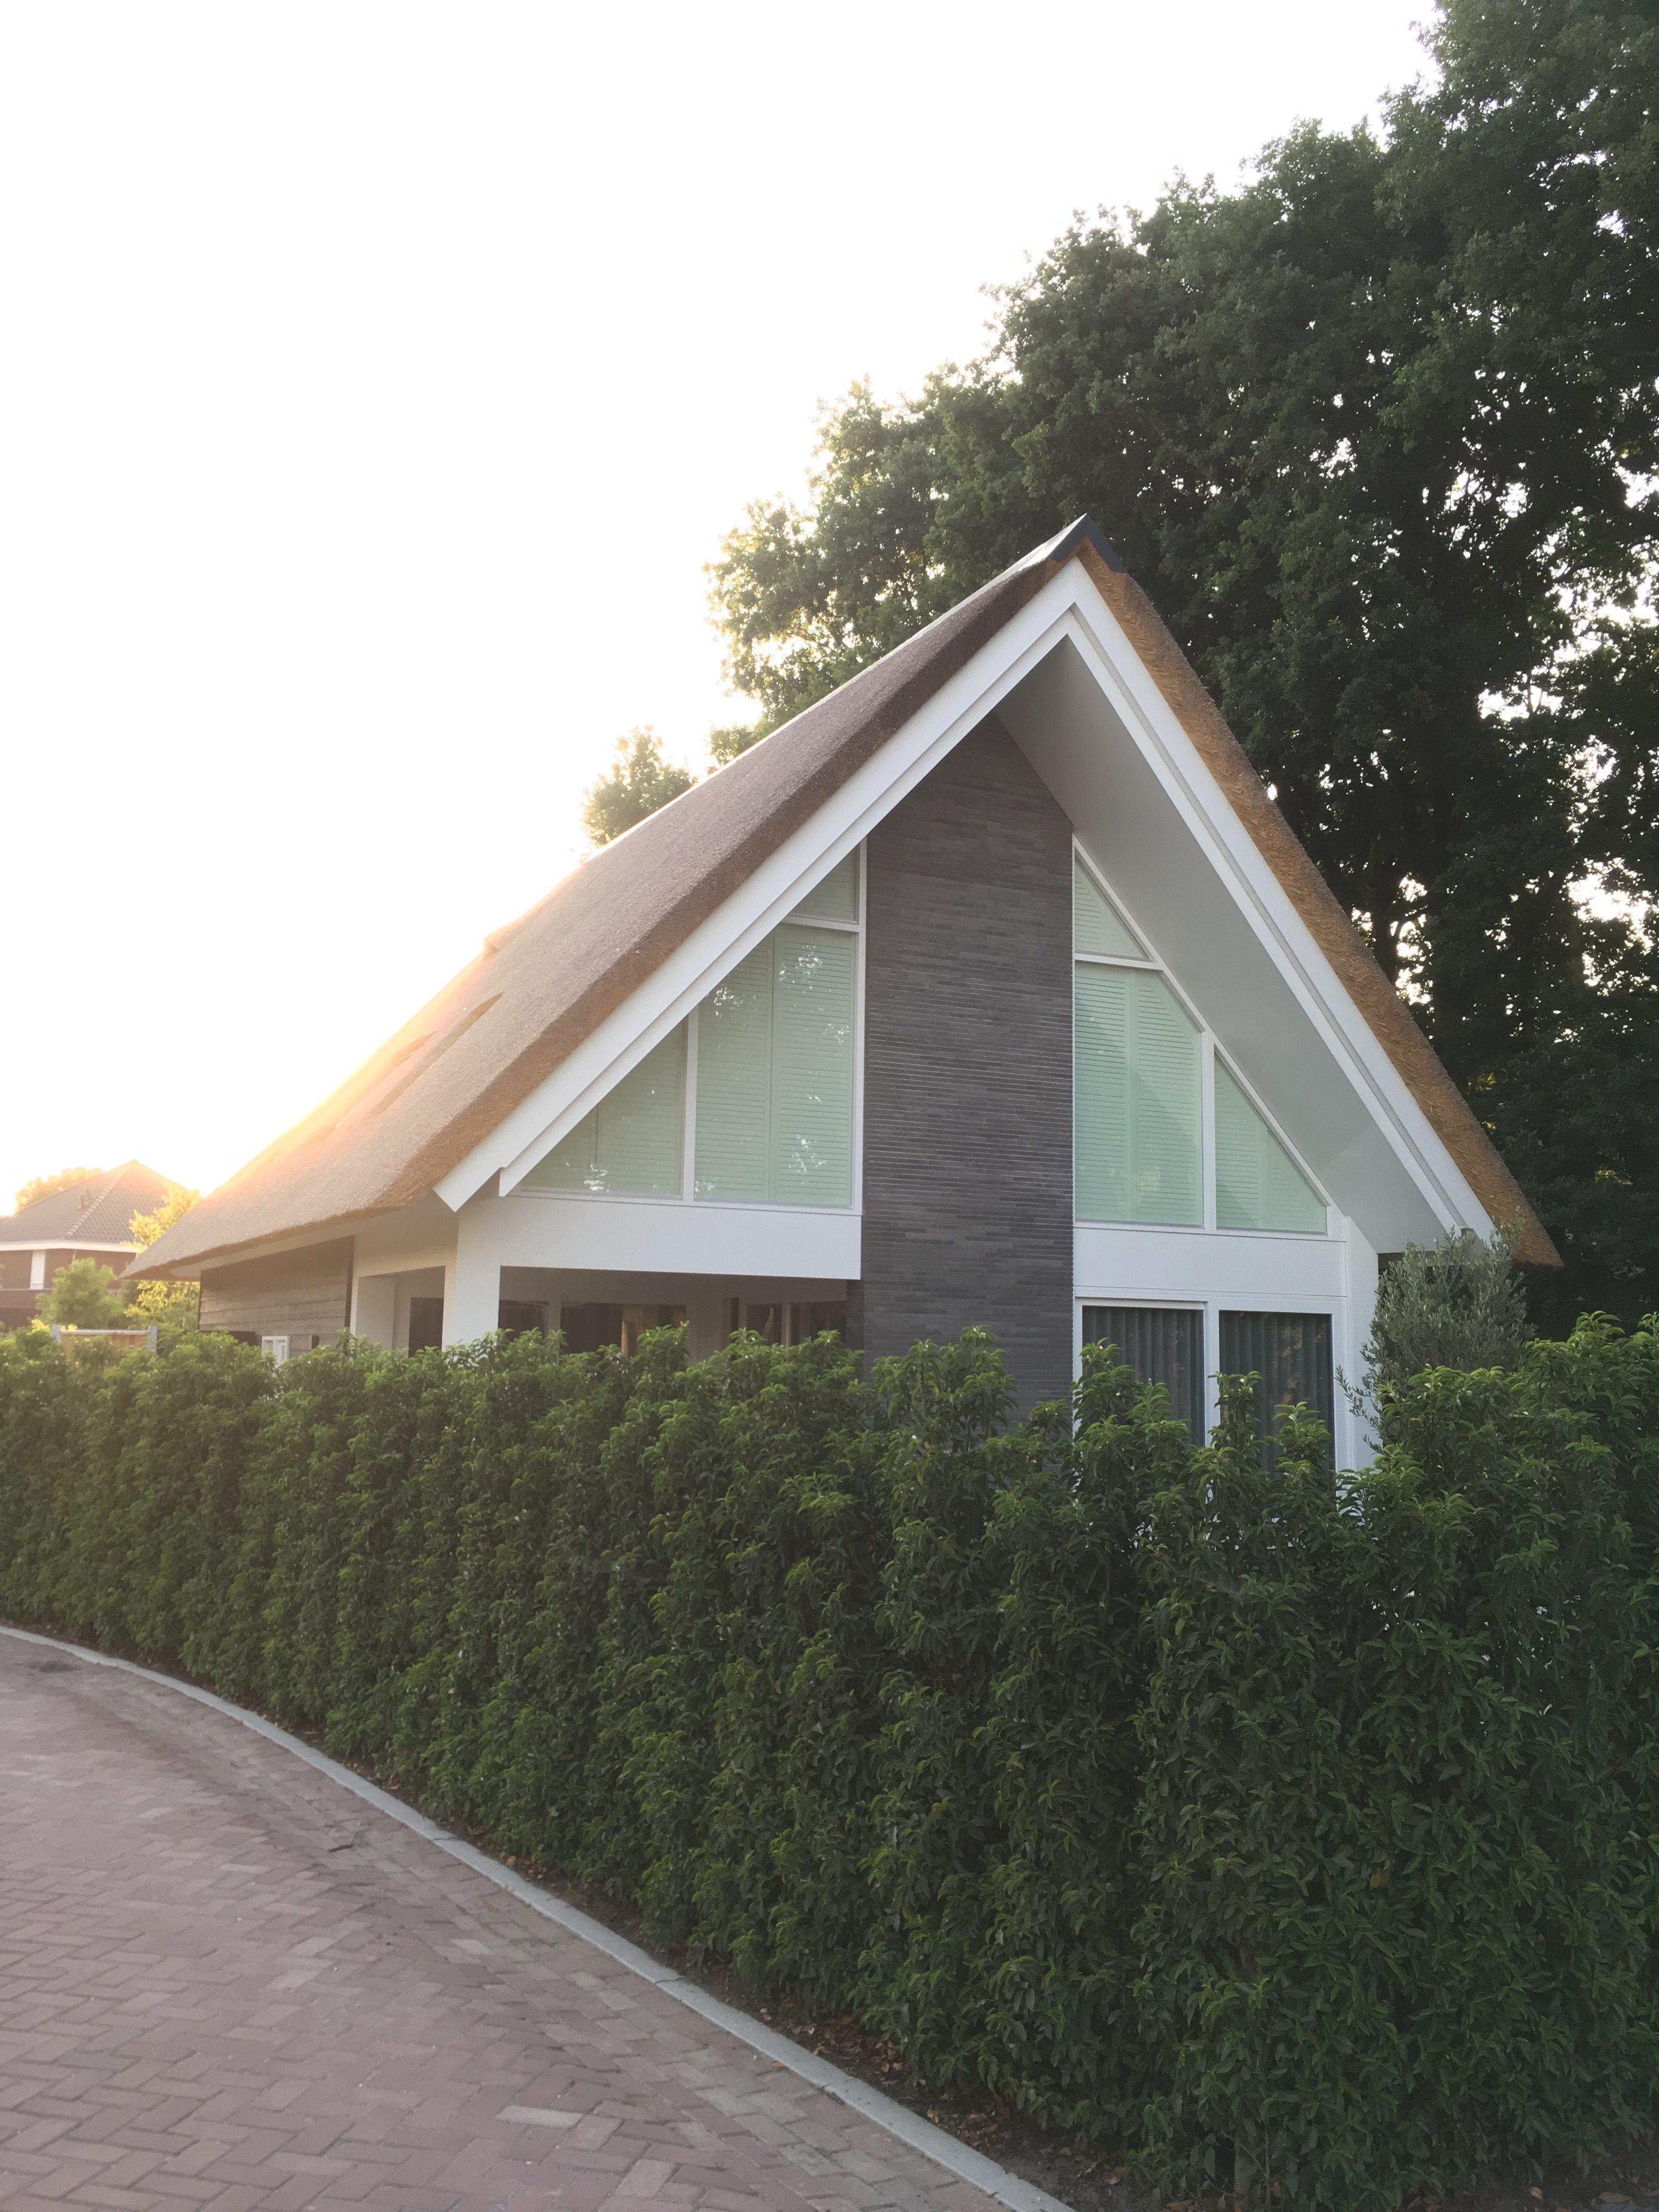 Landelijke nieuwbouwwoning